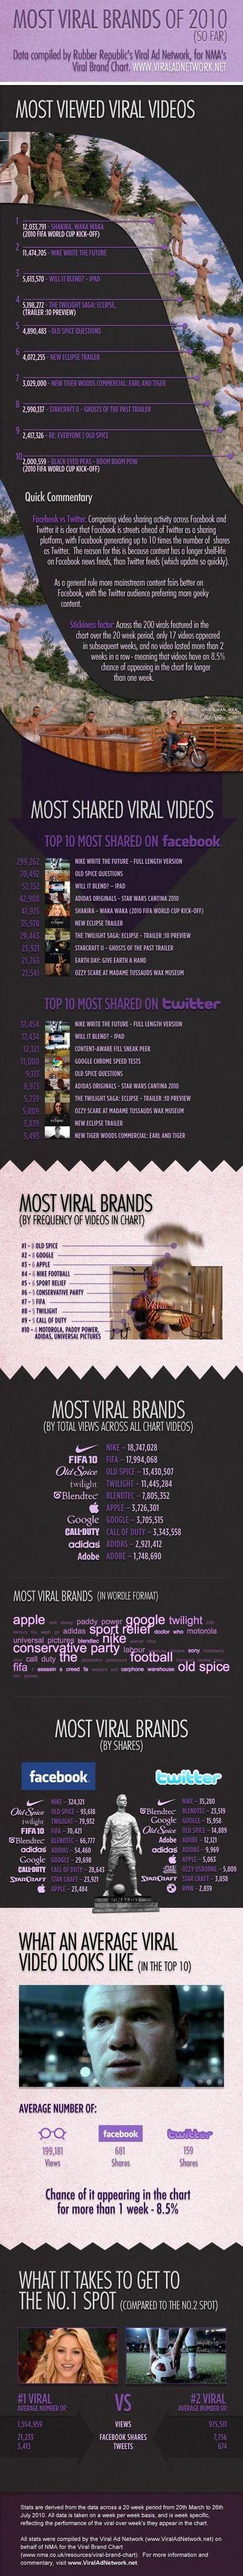 Viral brands 2010